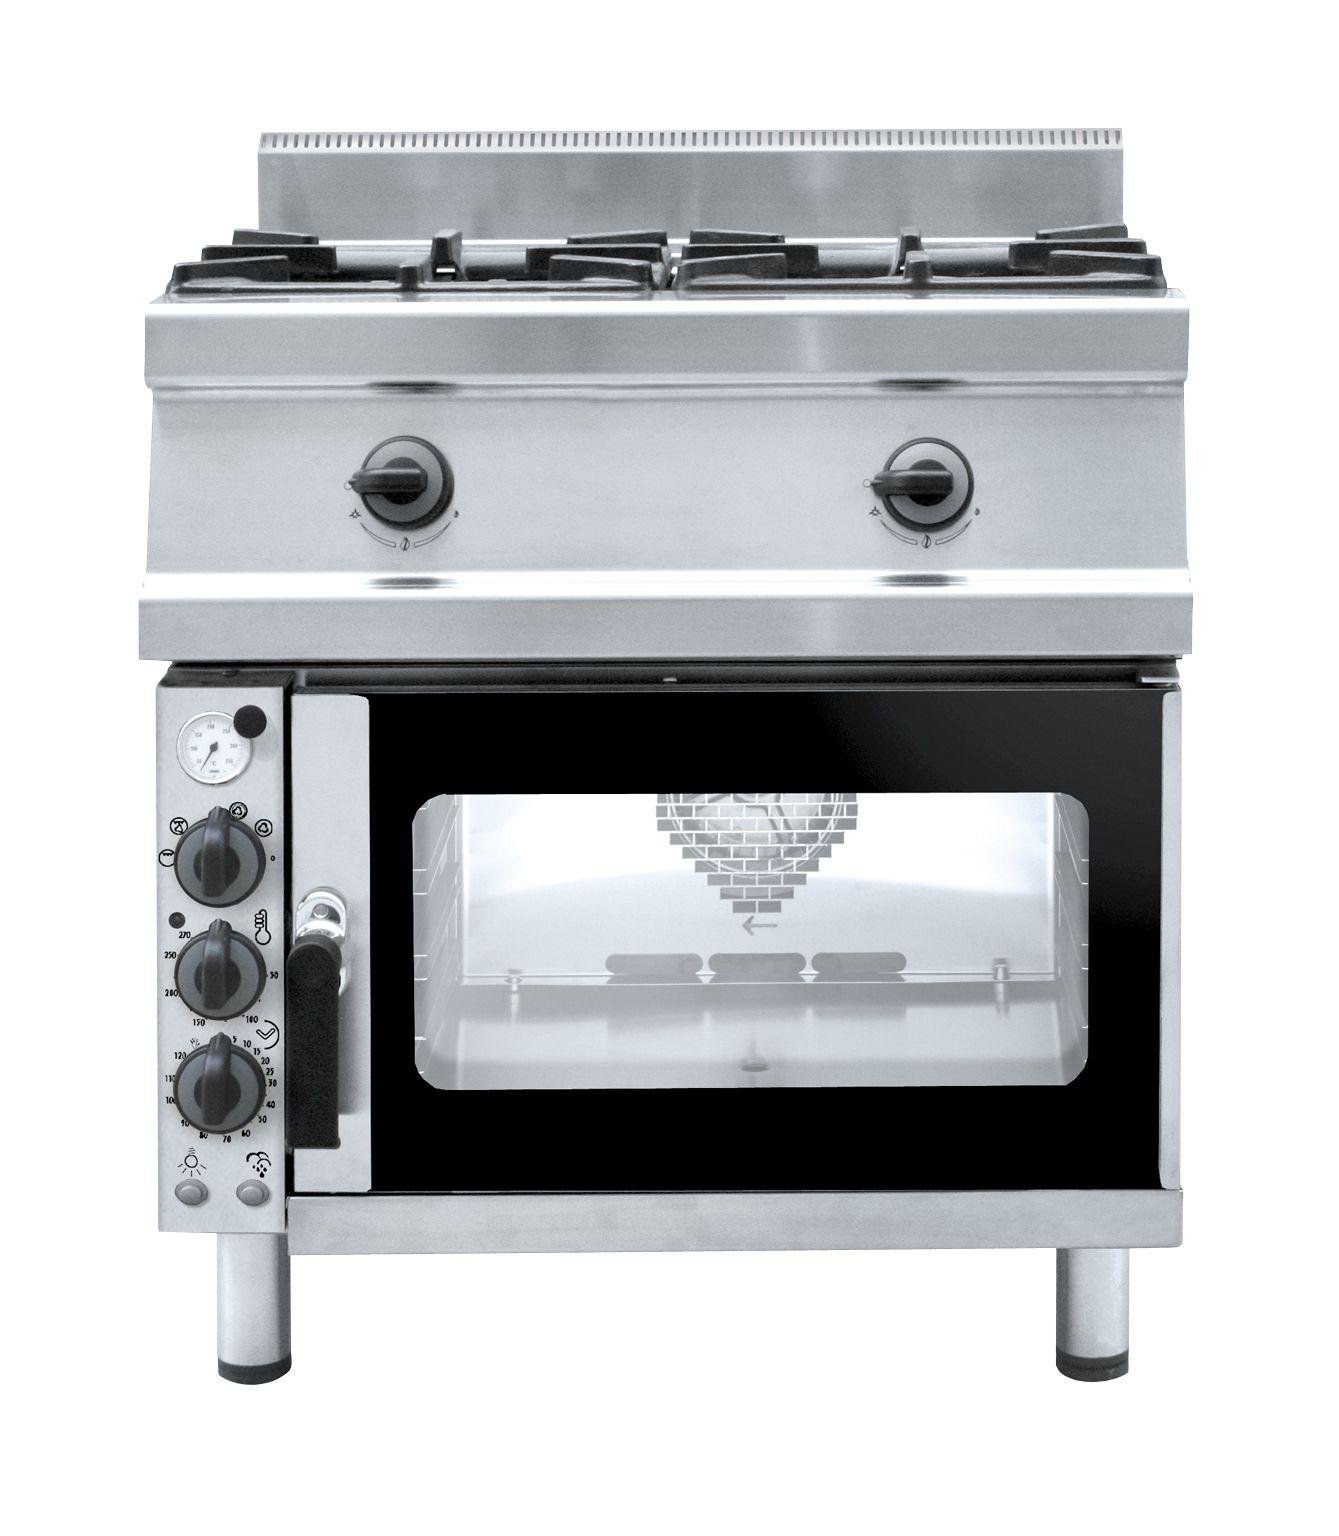 #cocina profesional con #horno a convección para espacios reducidos en cocinas que precisen producciones (www.pro-kitchens.com)